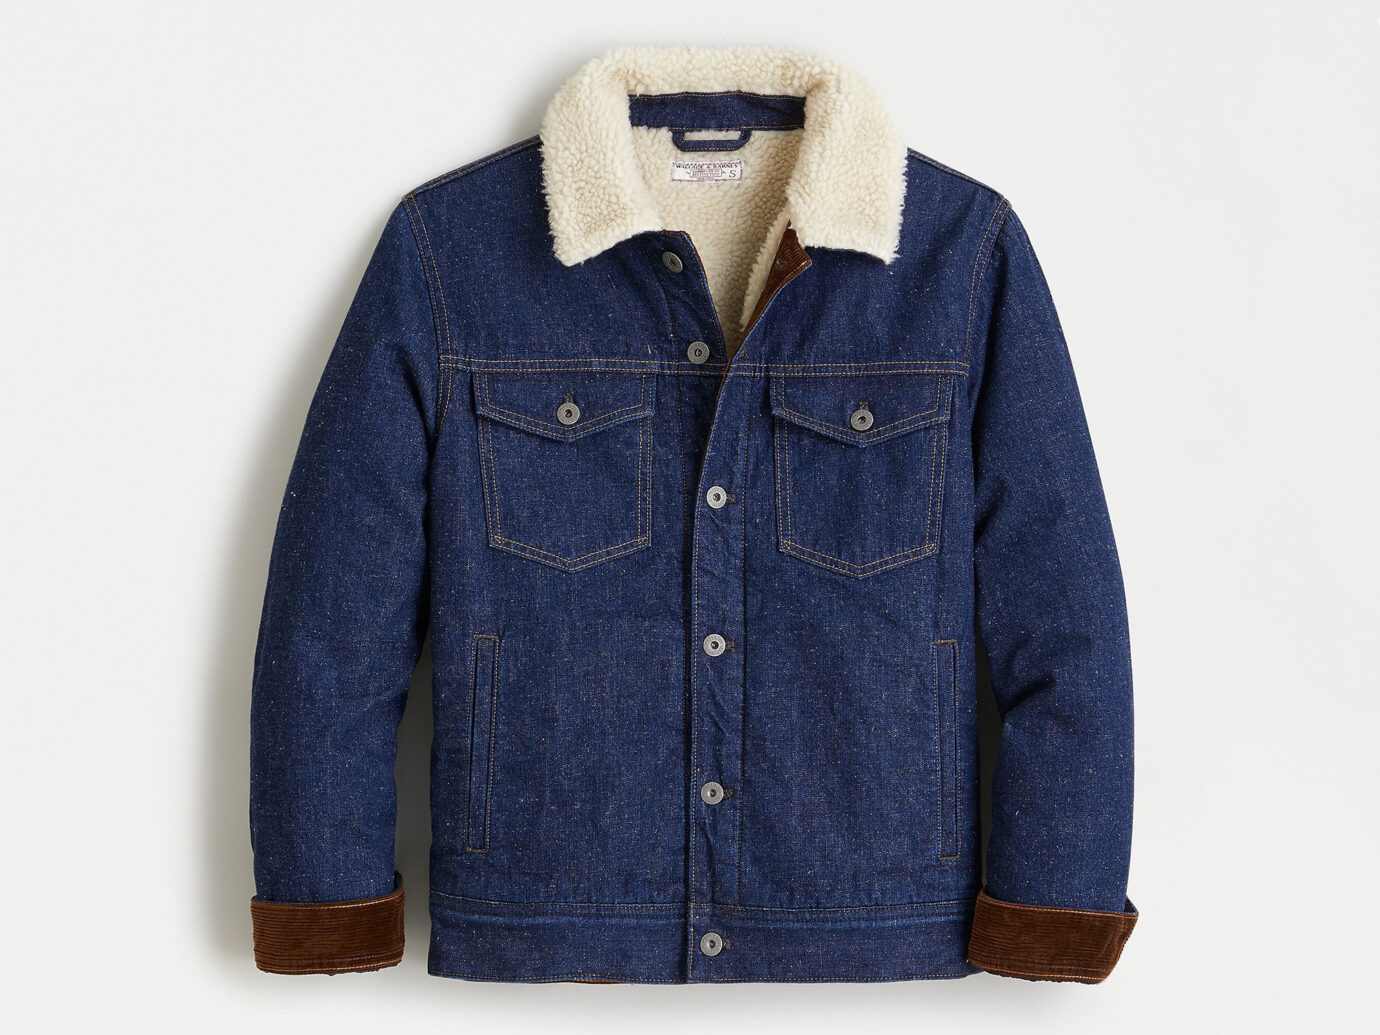 J.Crew Japanese denim trucker jacket with sherpa collar